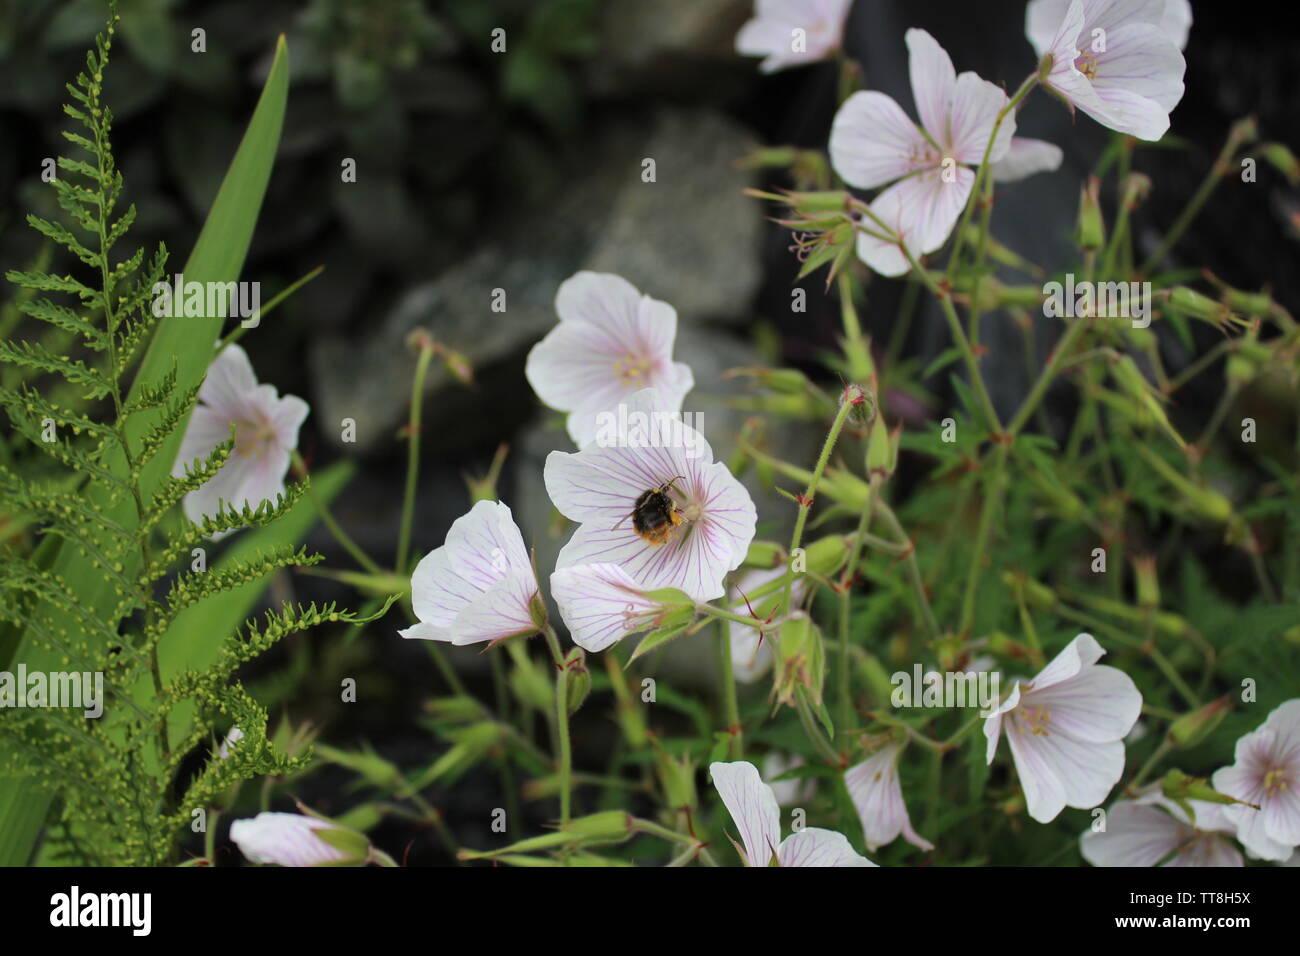 Bee on Kashmiri White Geranium - Stock Image